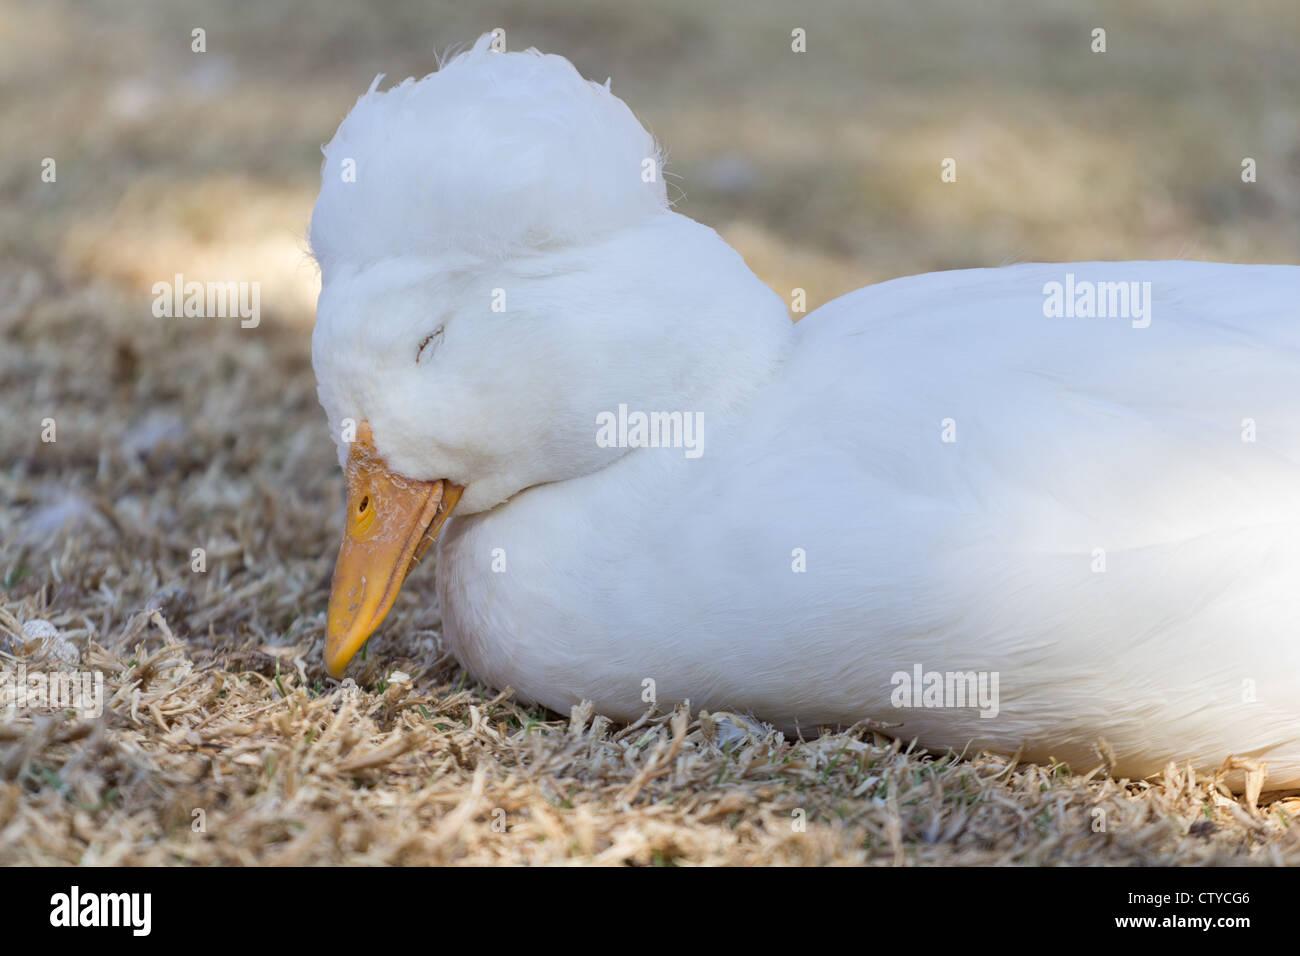 A beautiful little sleepy duck of the anatidae family - Stock Image